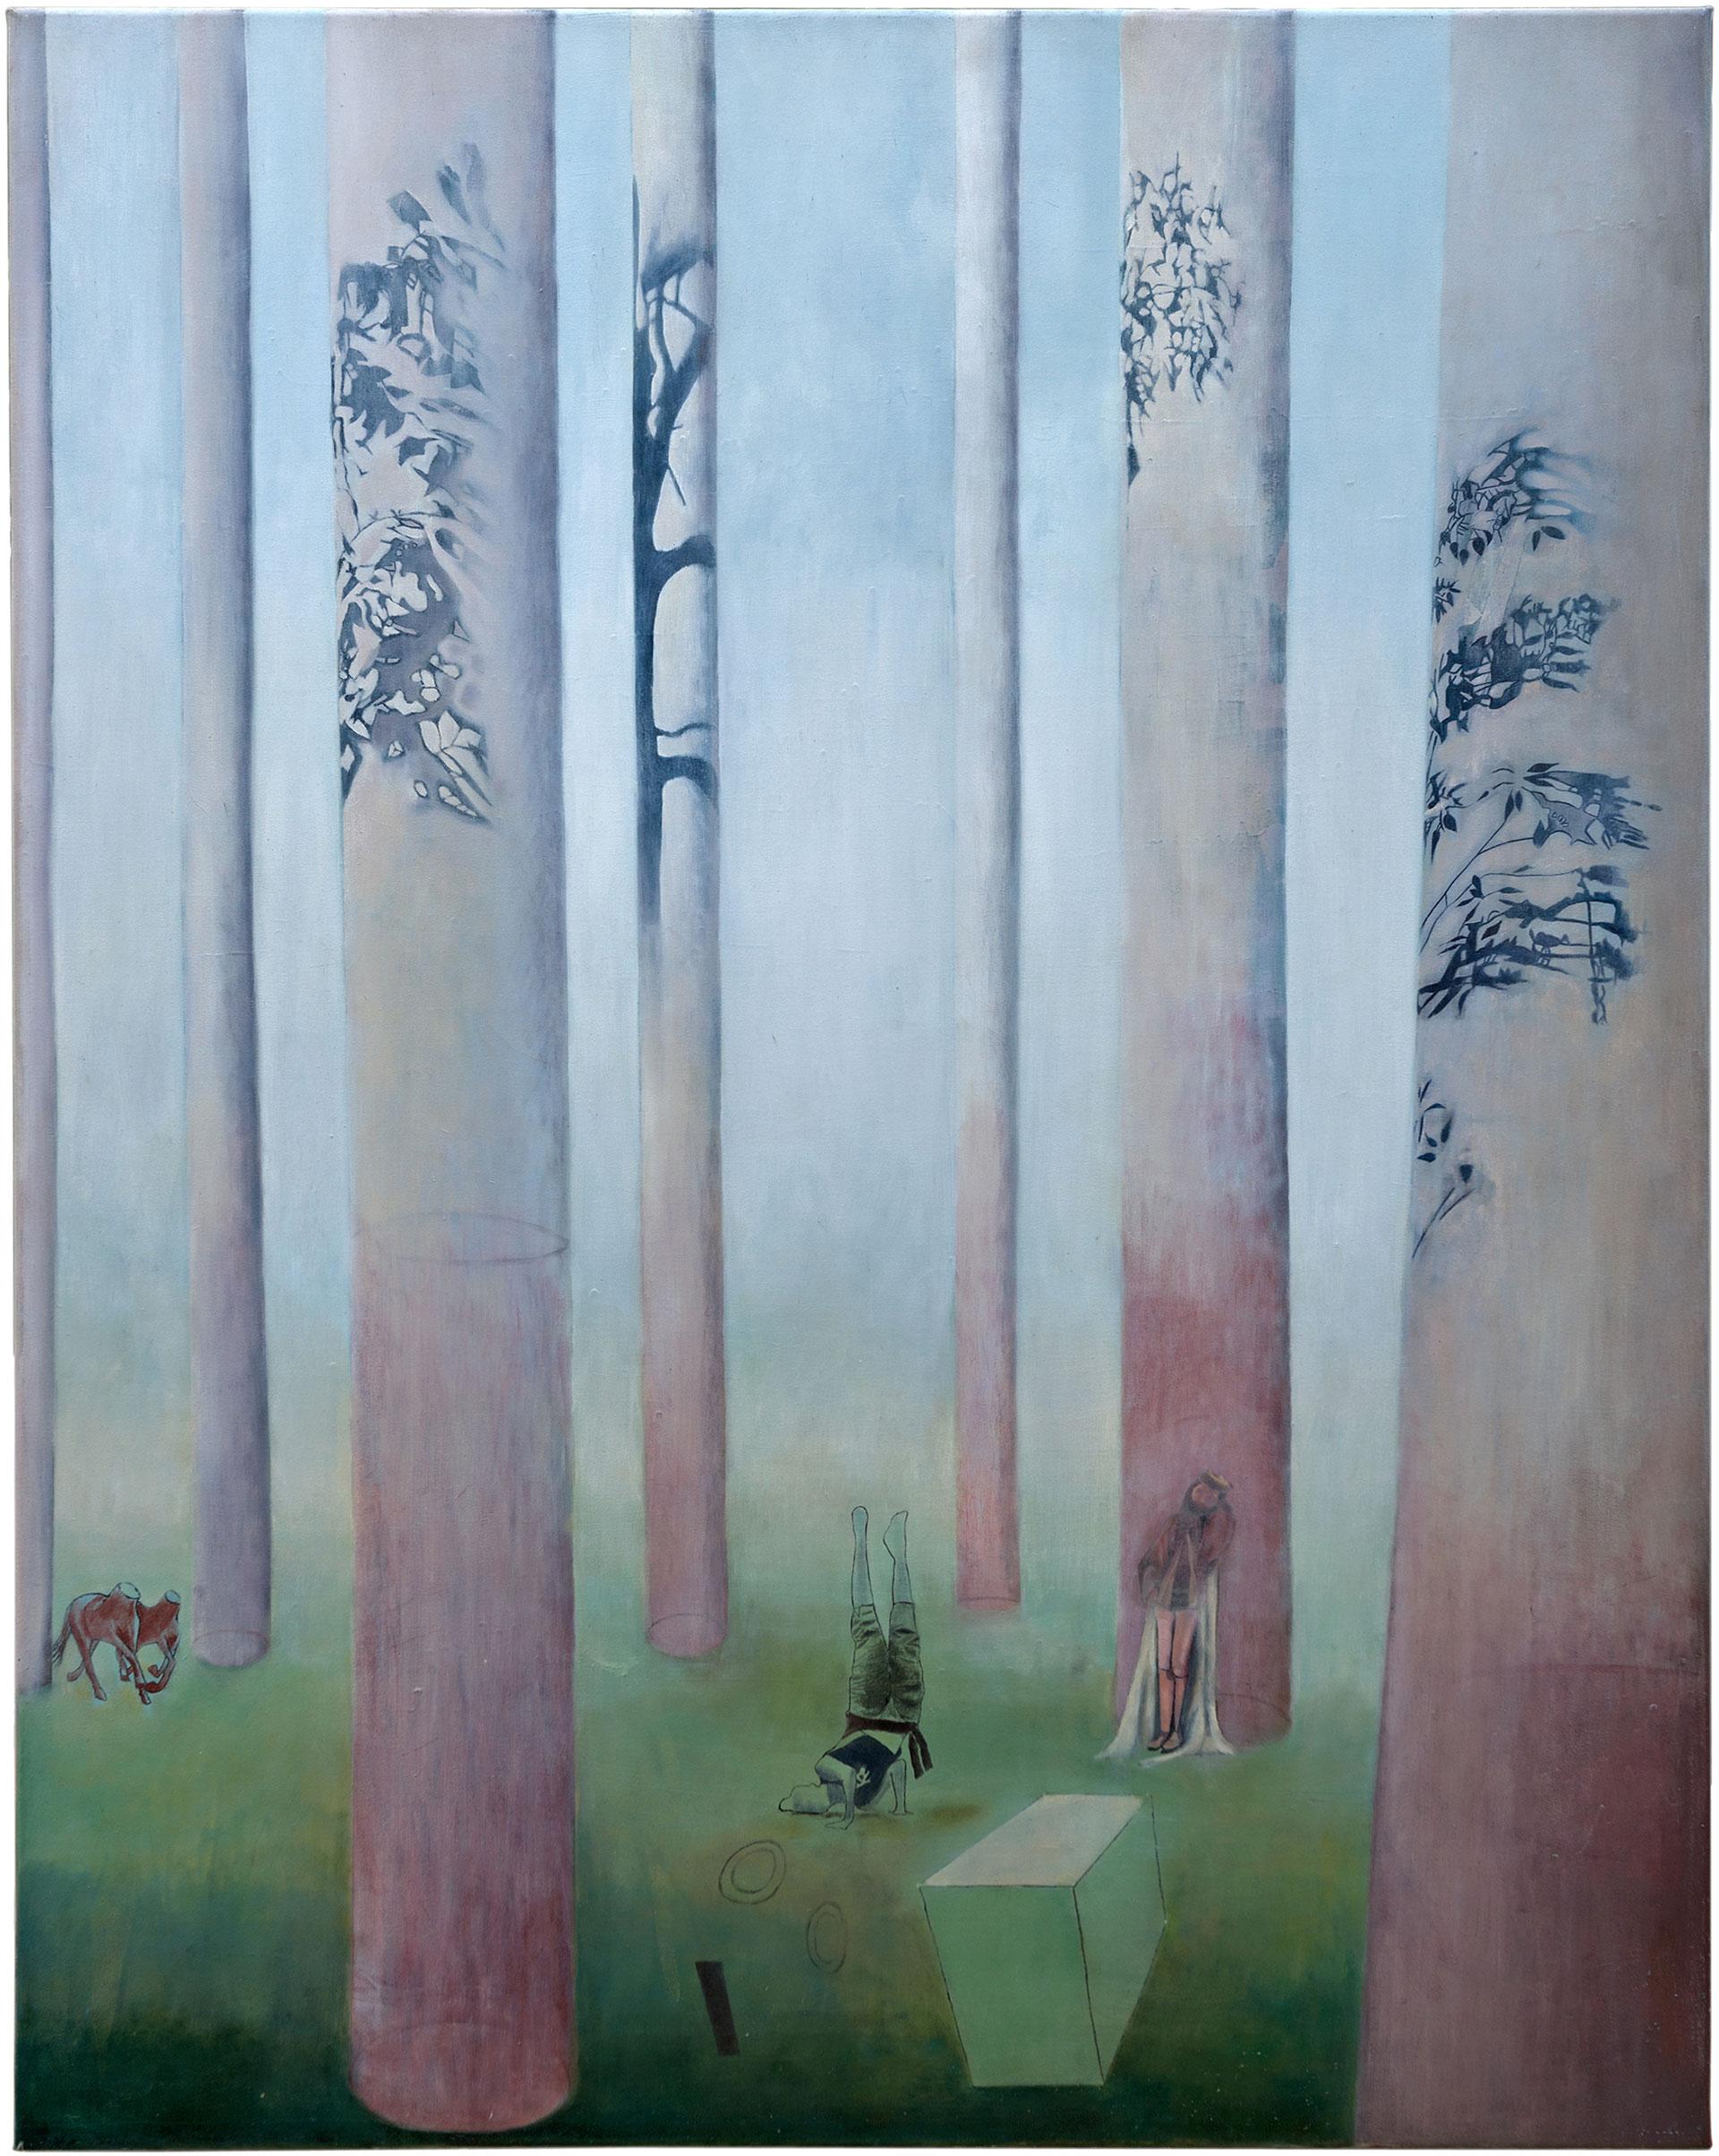 Madeleine Kelly Logic Block 2003, oil on polyester 115 x 90cm